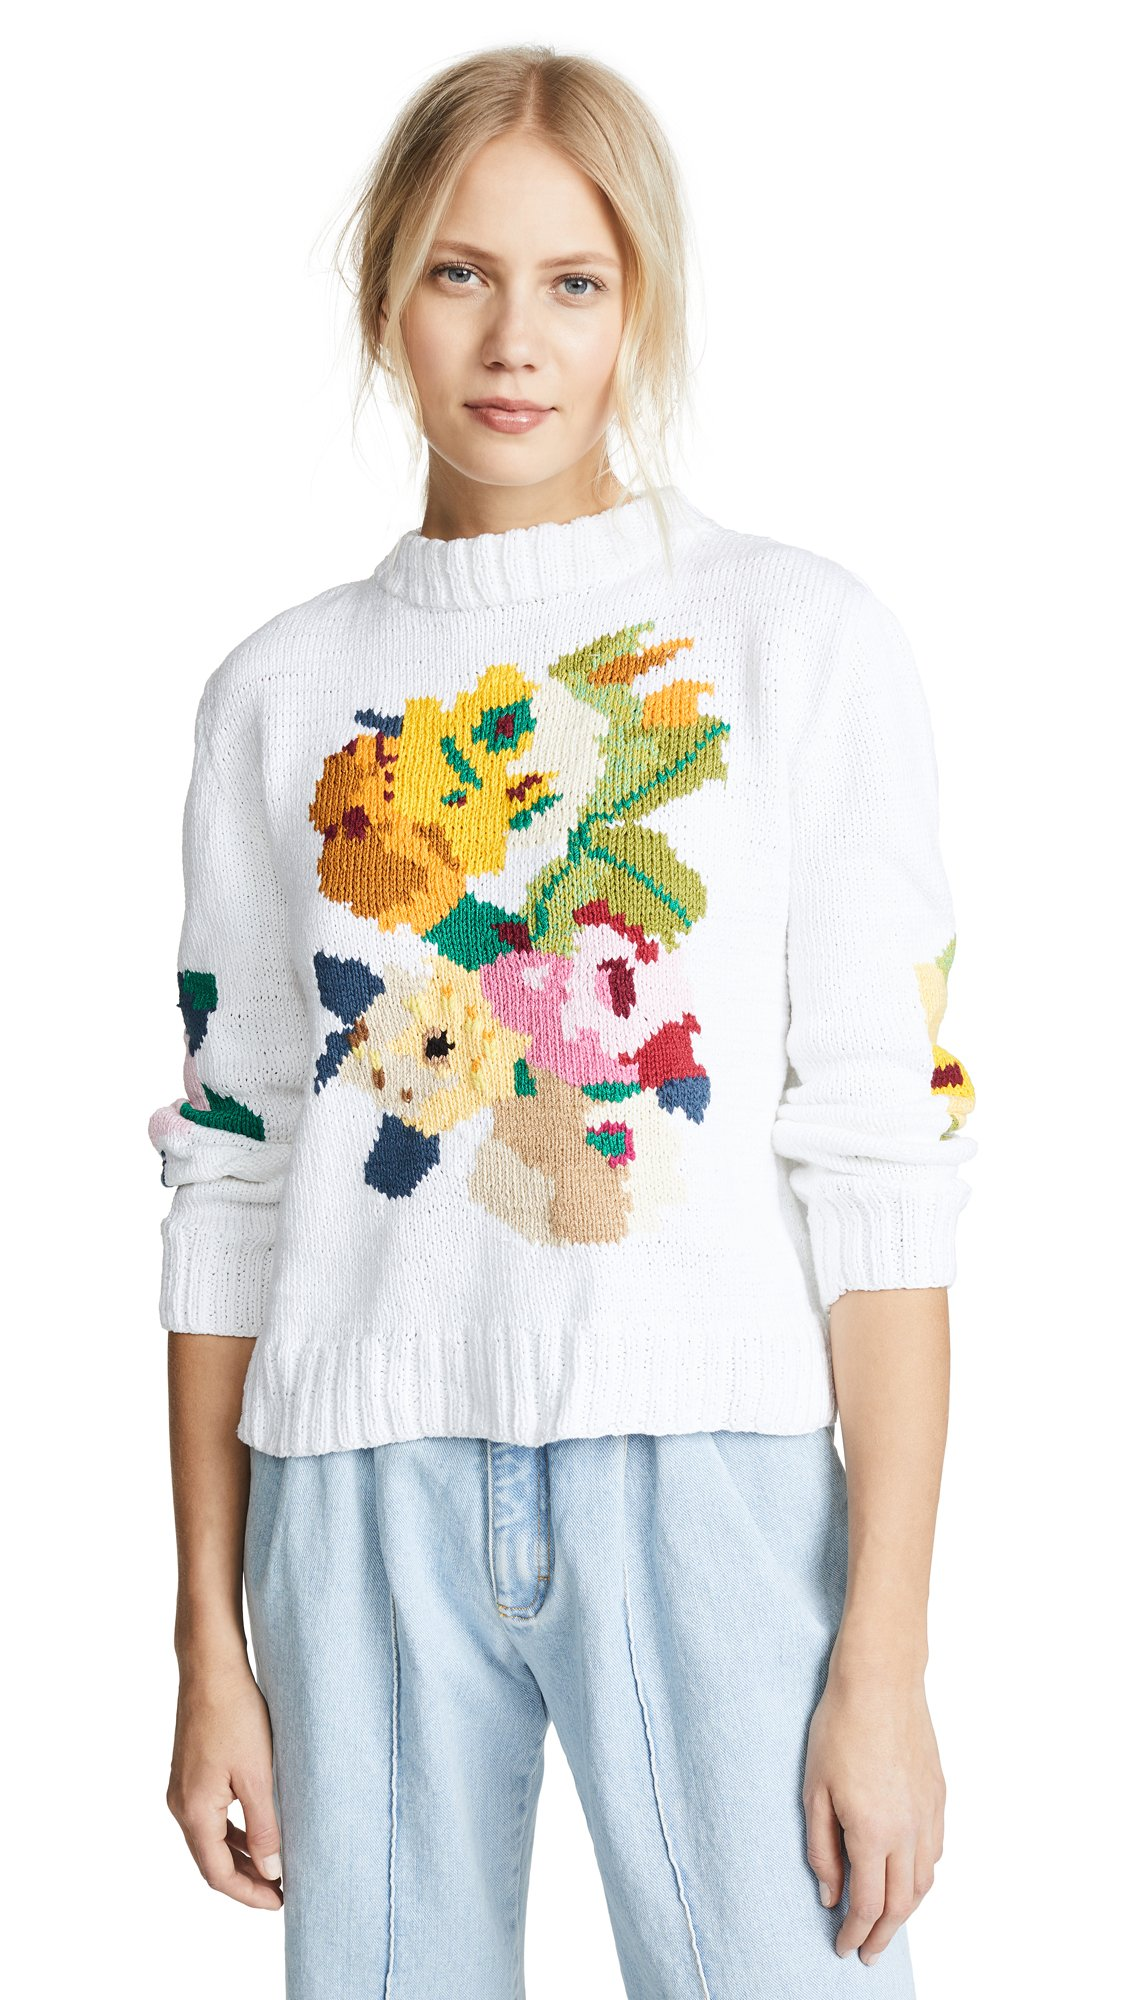 SMYTHE Women's Floral Intarsia Crew Sweater, White Multi, Small